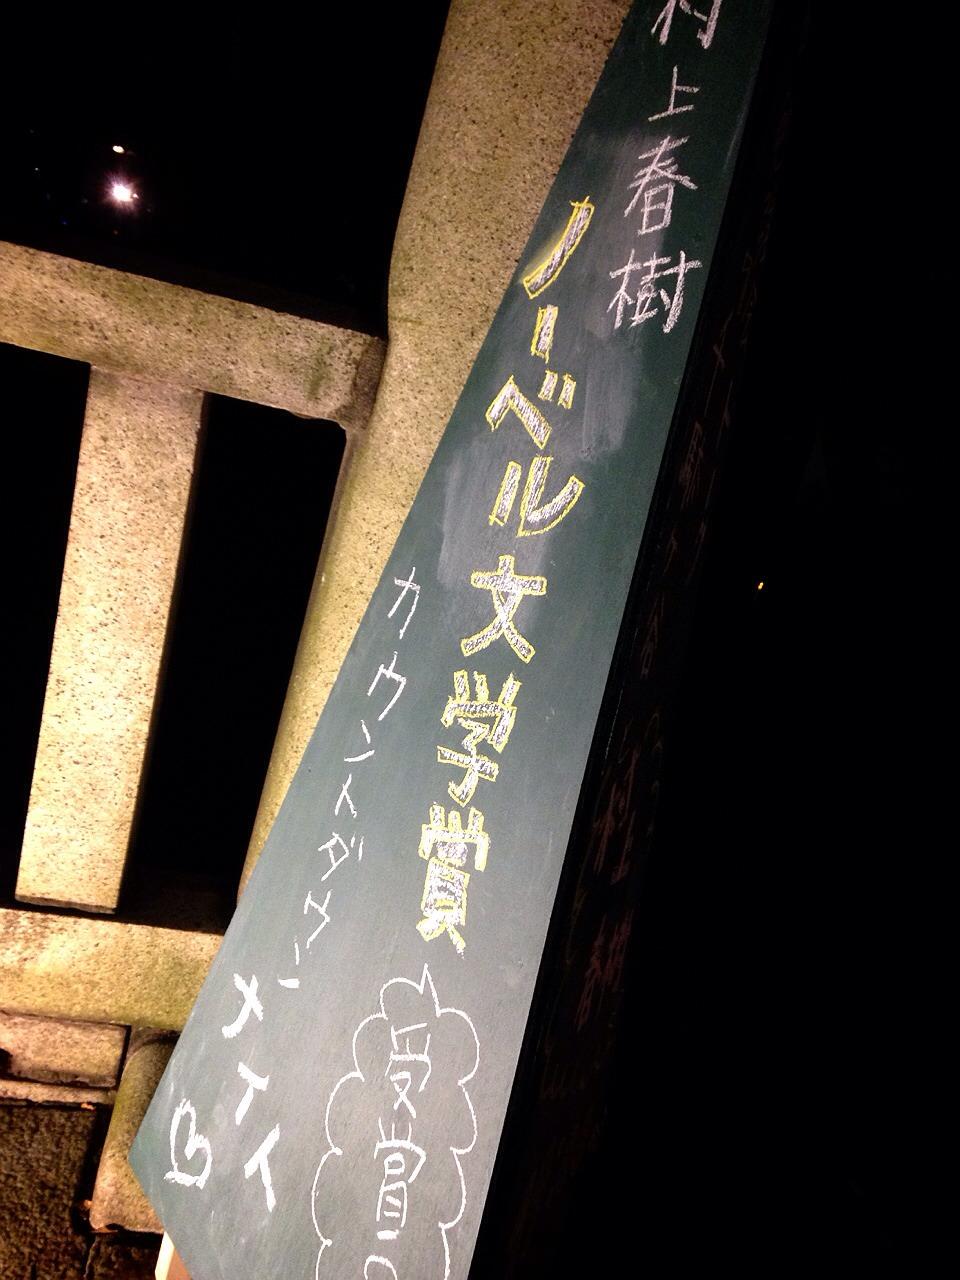 「残念村上春樹さん」_a0075684_2148618.jpg